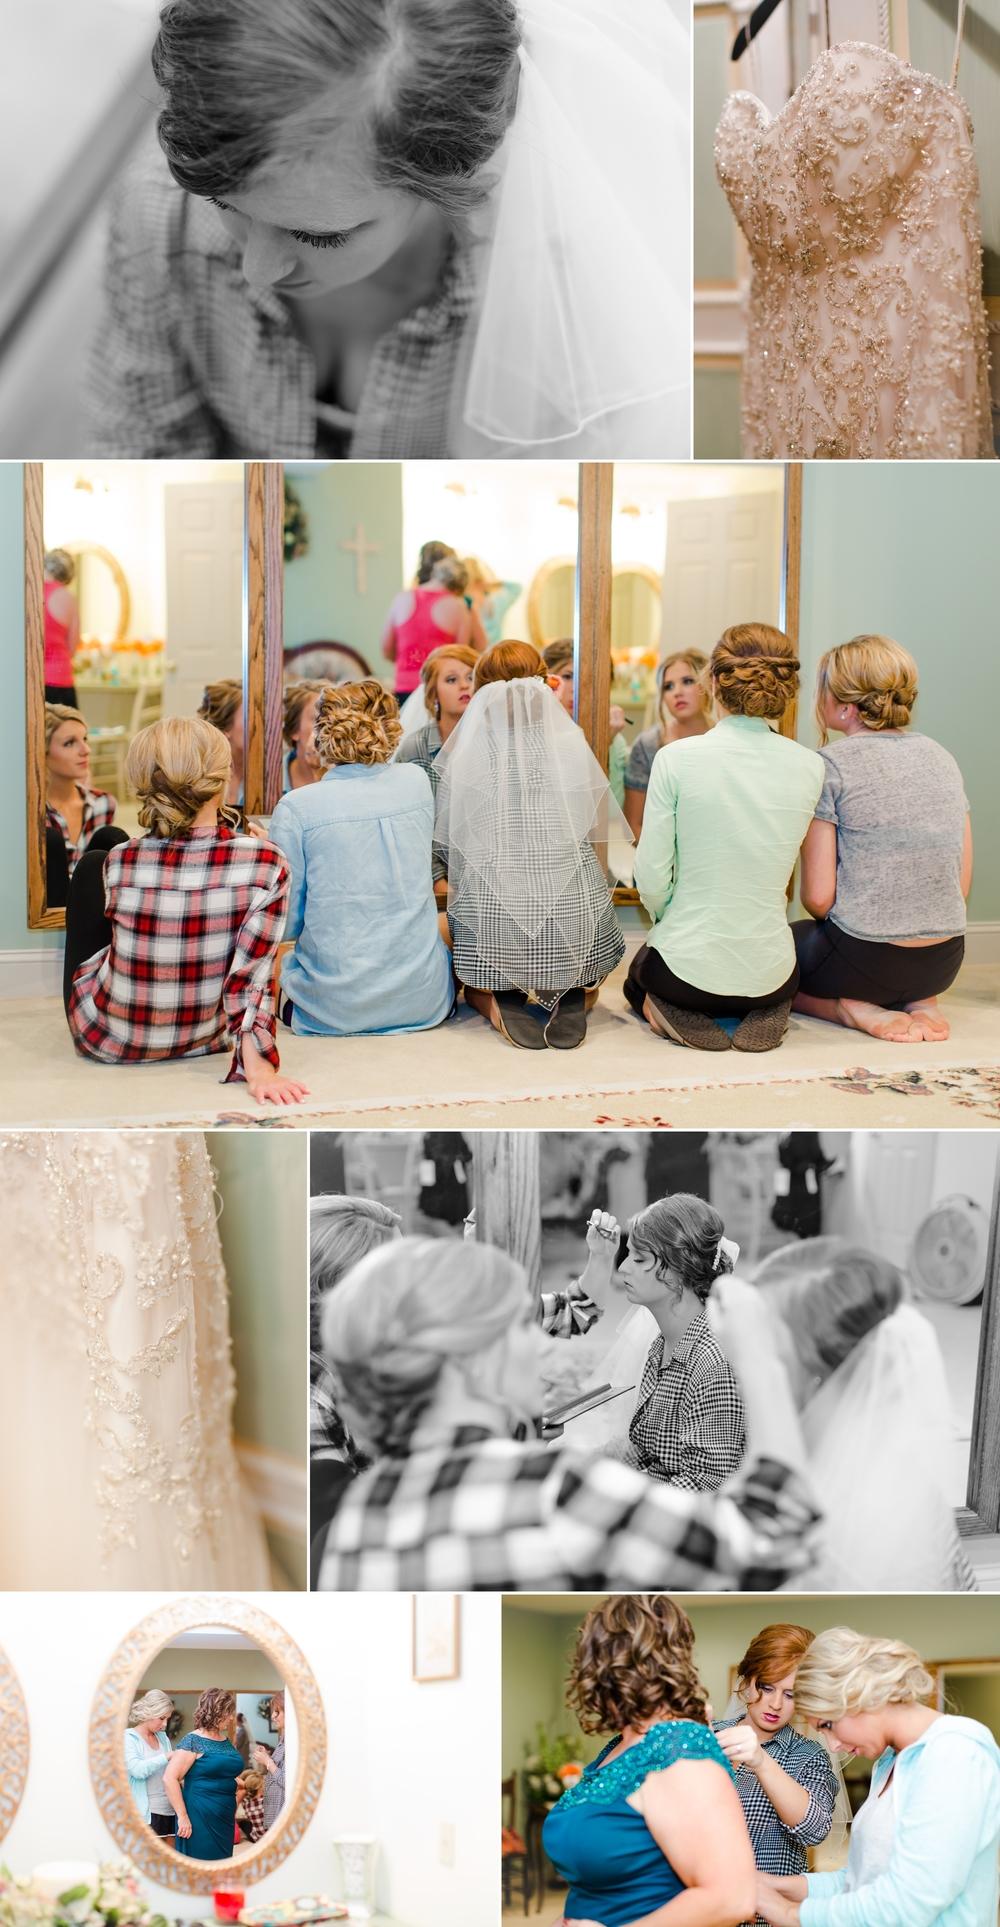 riverbend_chapel_washington_mo_wedding_photography_outdoor_venue_st_louis 1.jpg